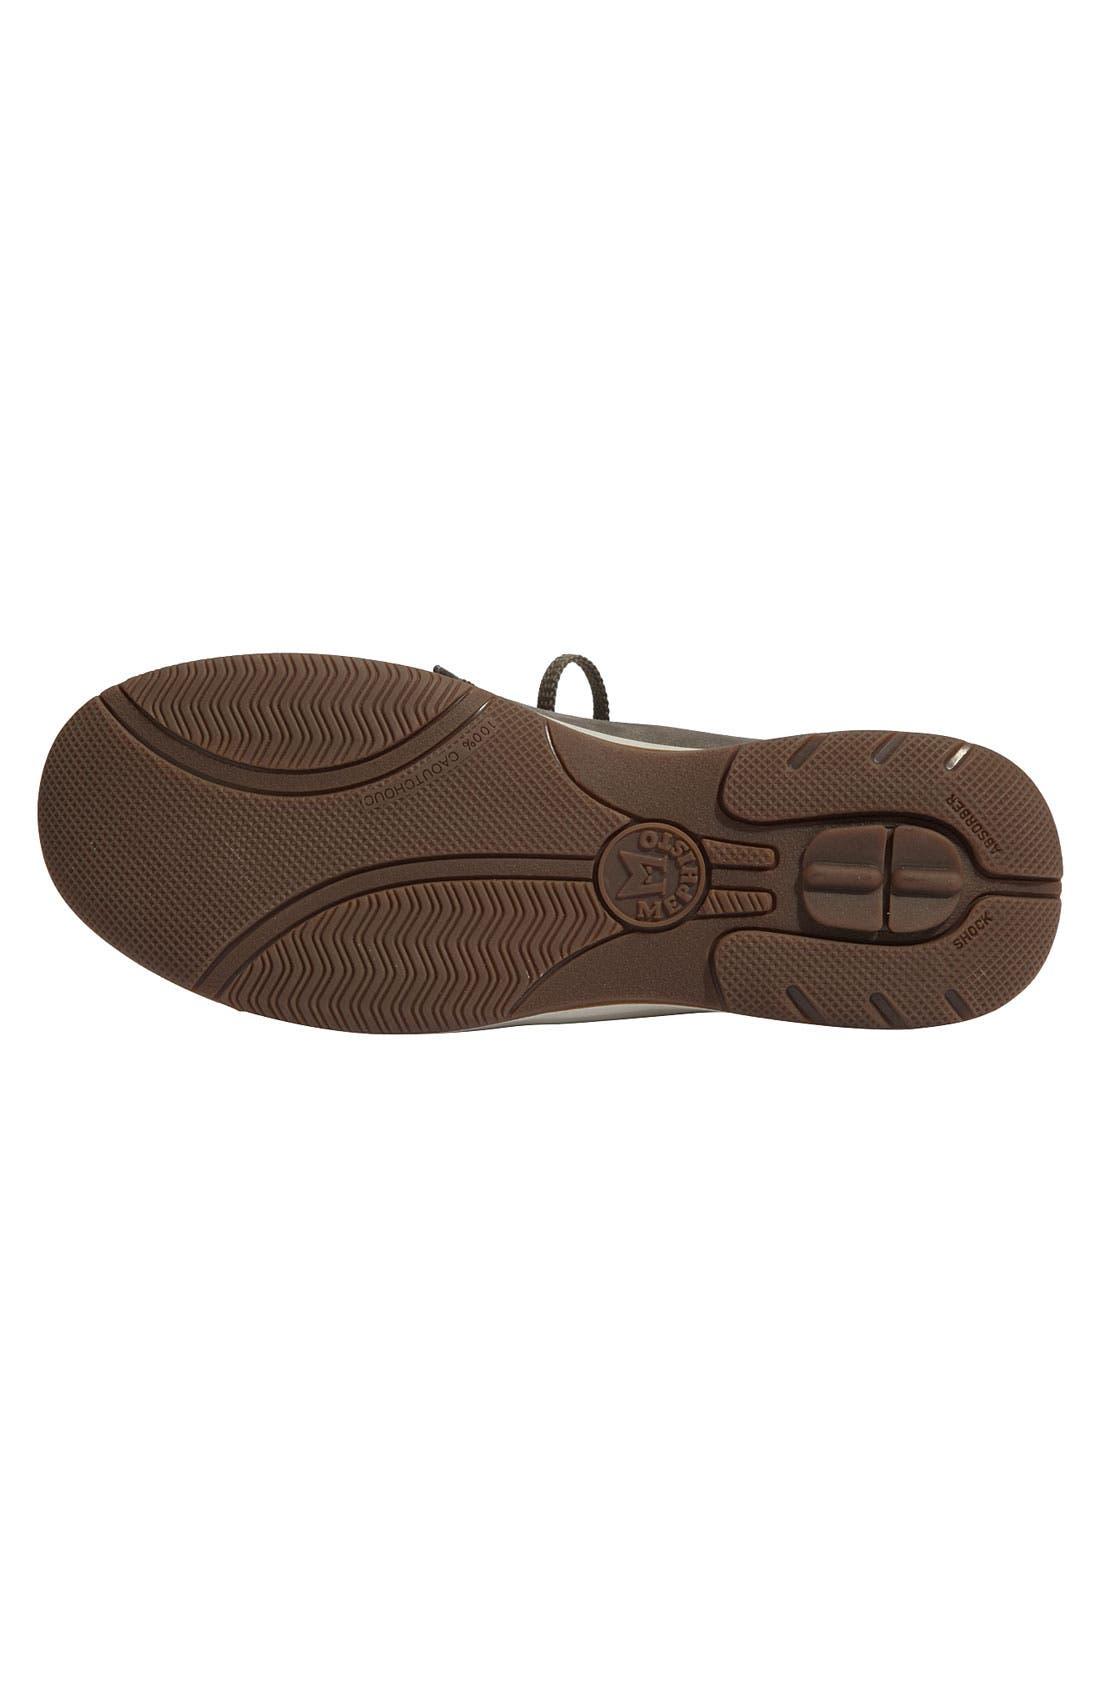 Alternate Image 4  - Mephisto 'Hike' Perforated Walking Shoe (Men)